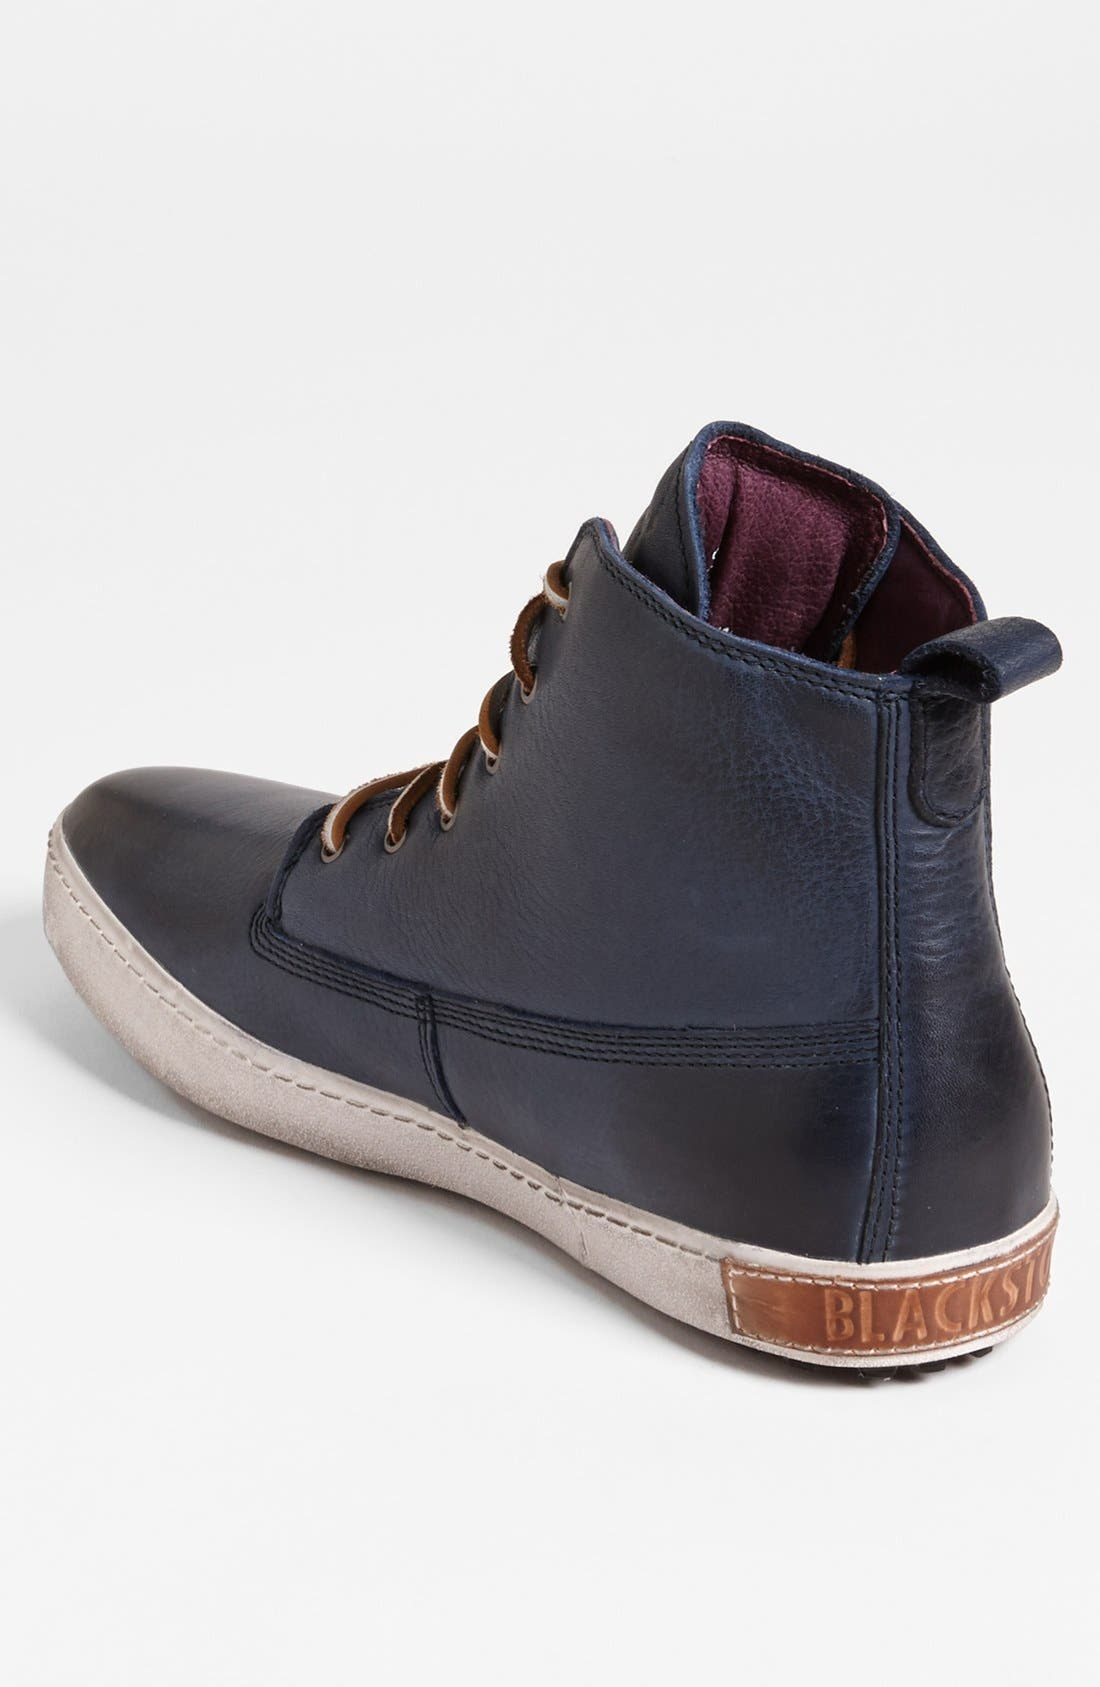 Alternate Image 2  - Blackstone 'AM 02' High Top Sneaker